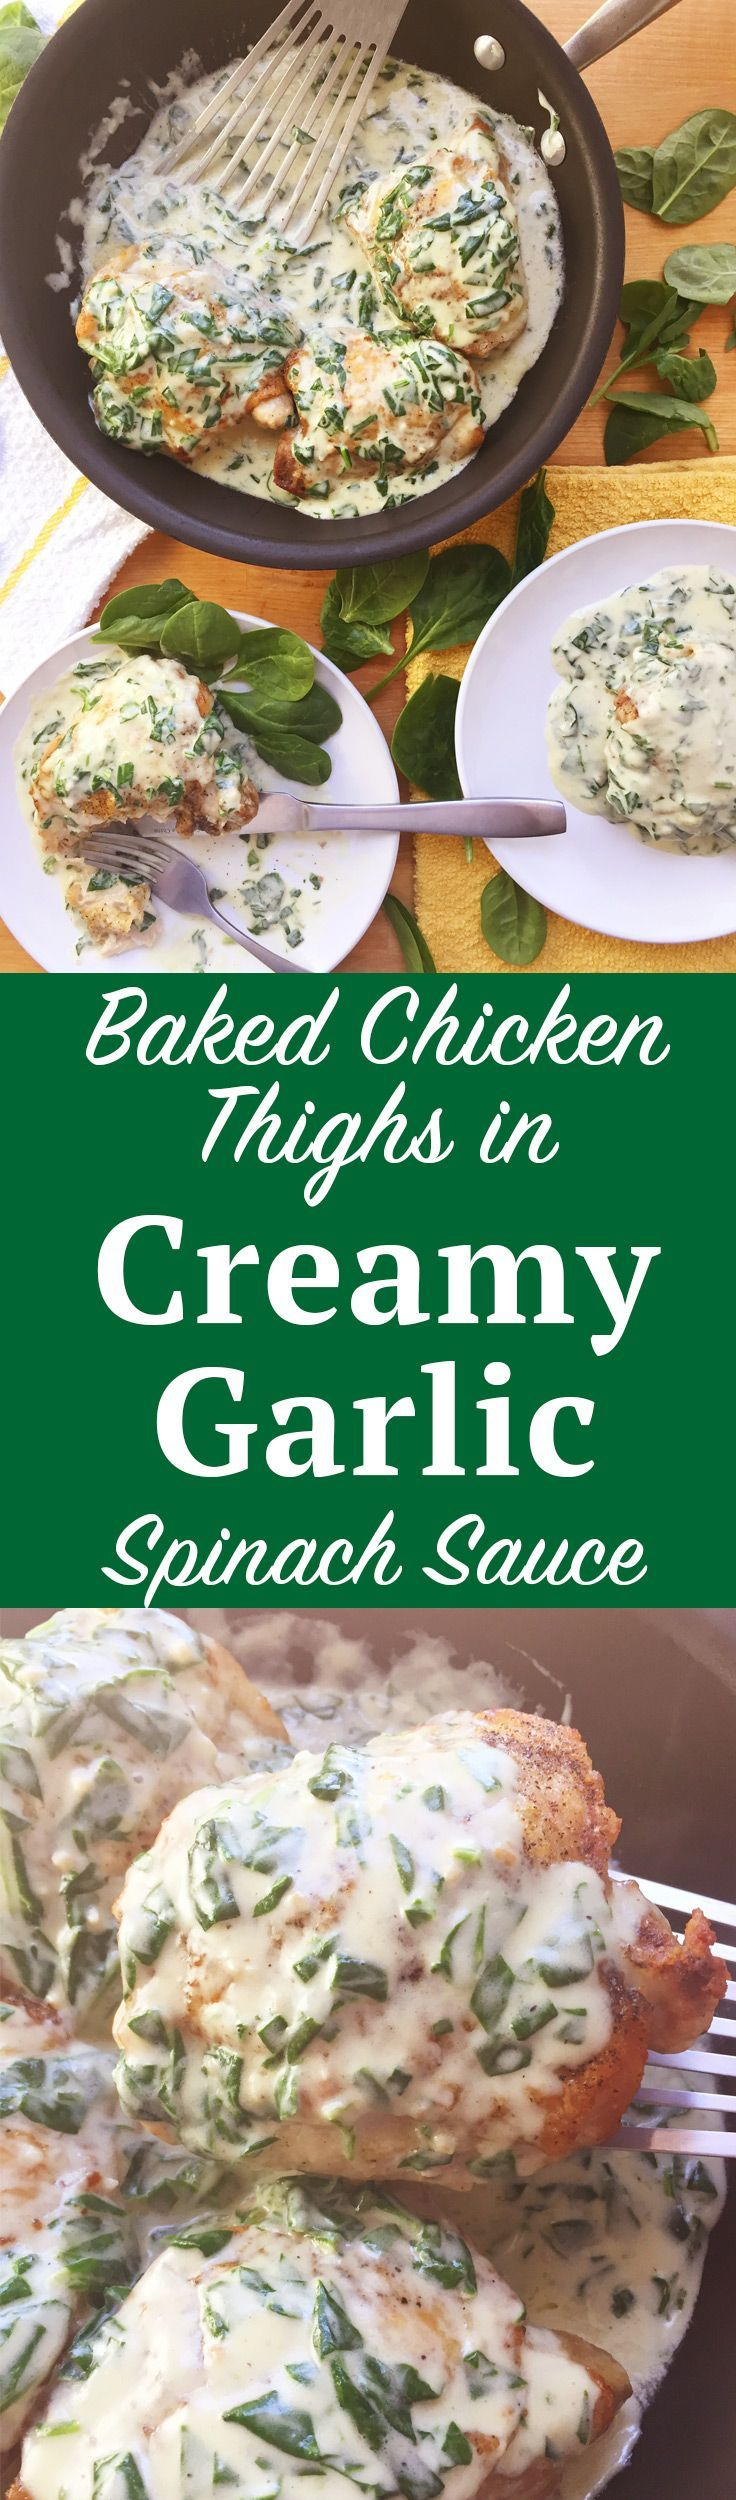 Baked Chicken Thighs with Creamy Garlic Spinach Sauce -